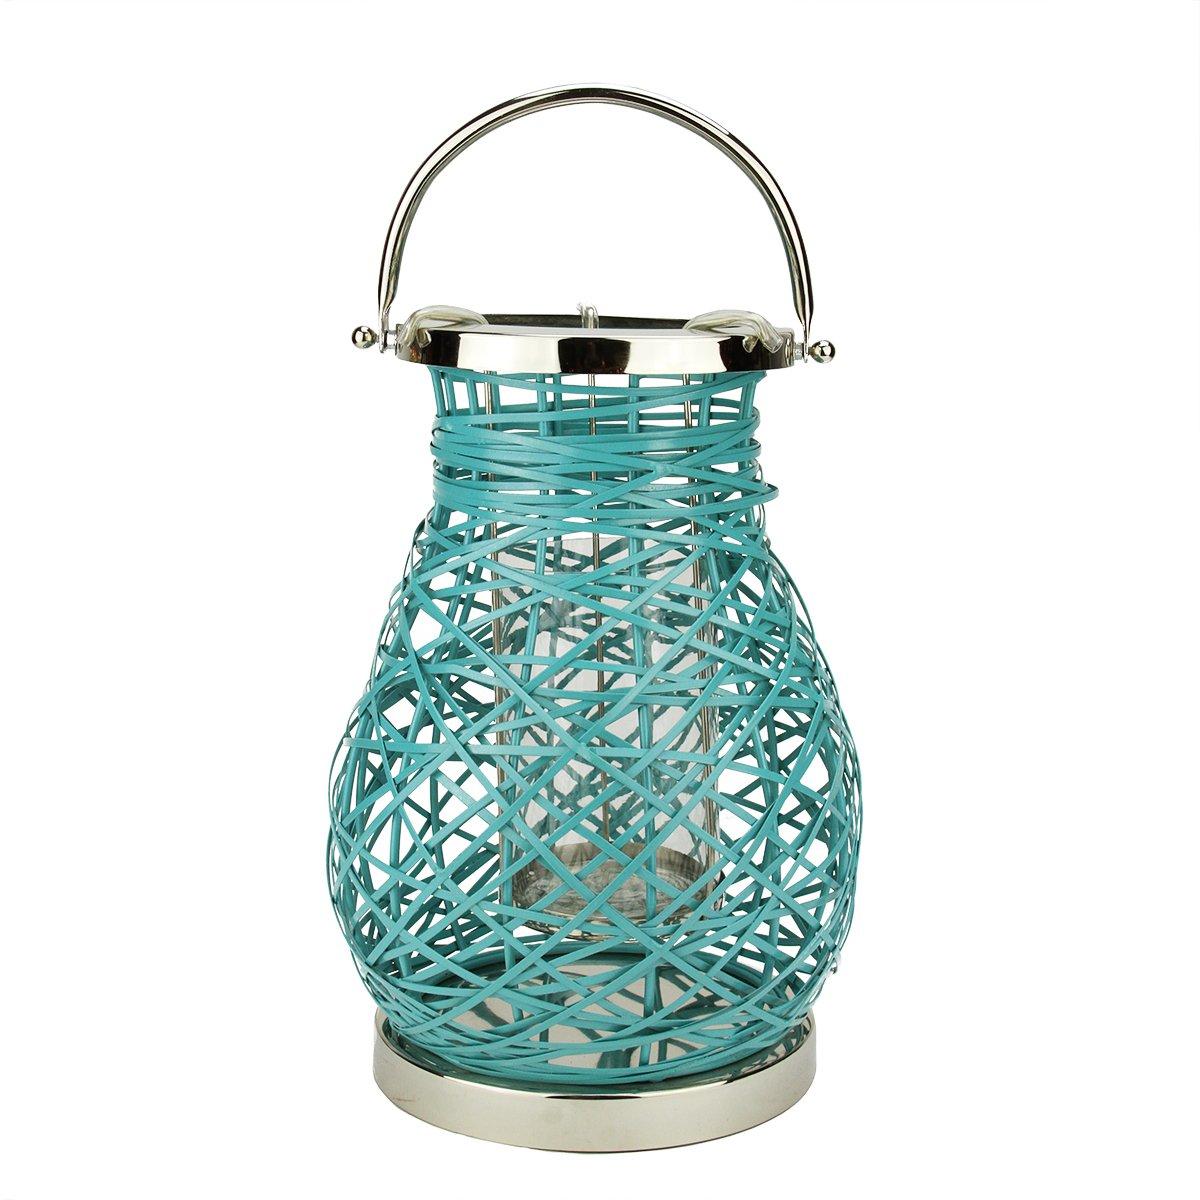 Amazon.com: Northlight Modern Turquoise Blue Decorative Woven Iron ...